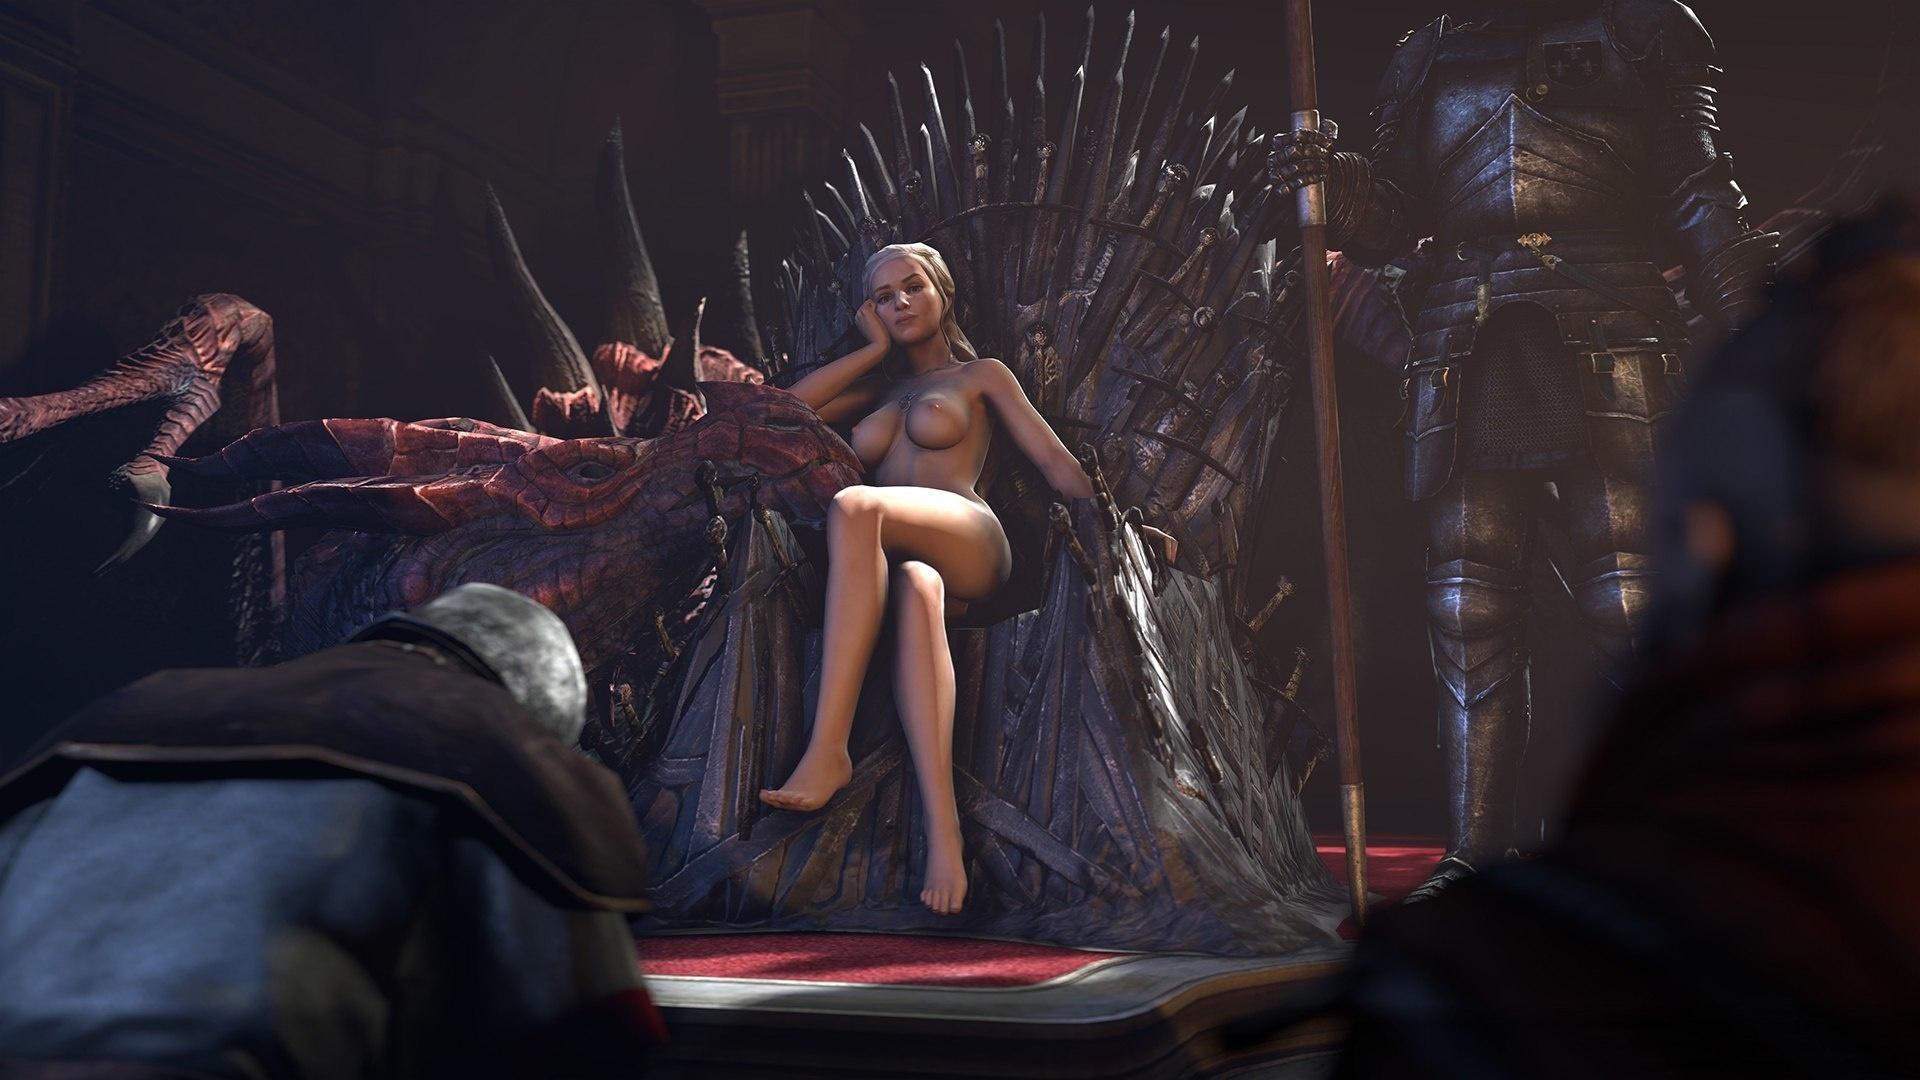 Targaryen hentai daenerys personagem:Daenerys Targaryen